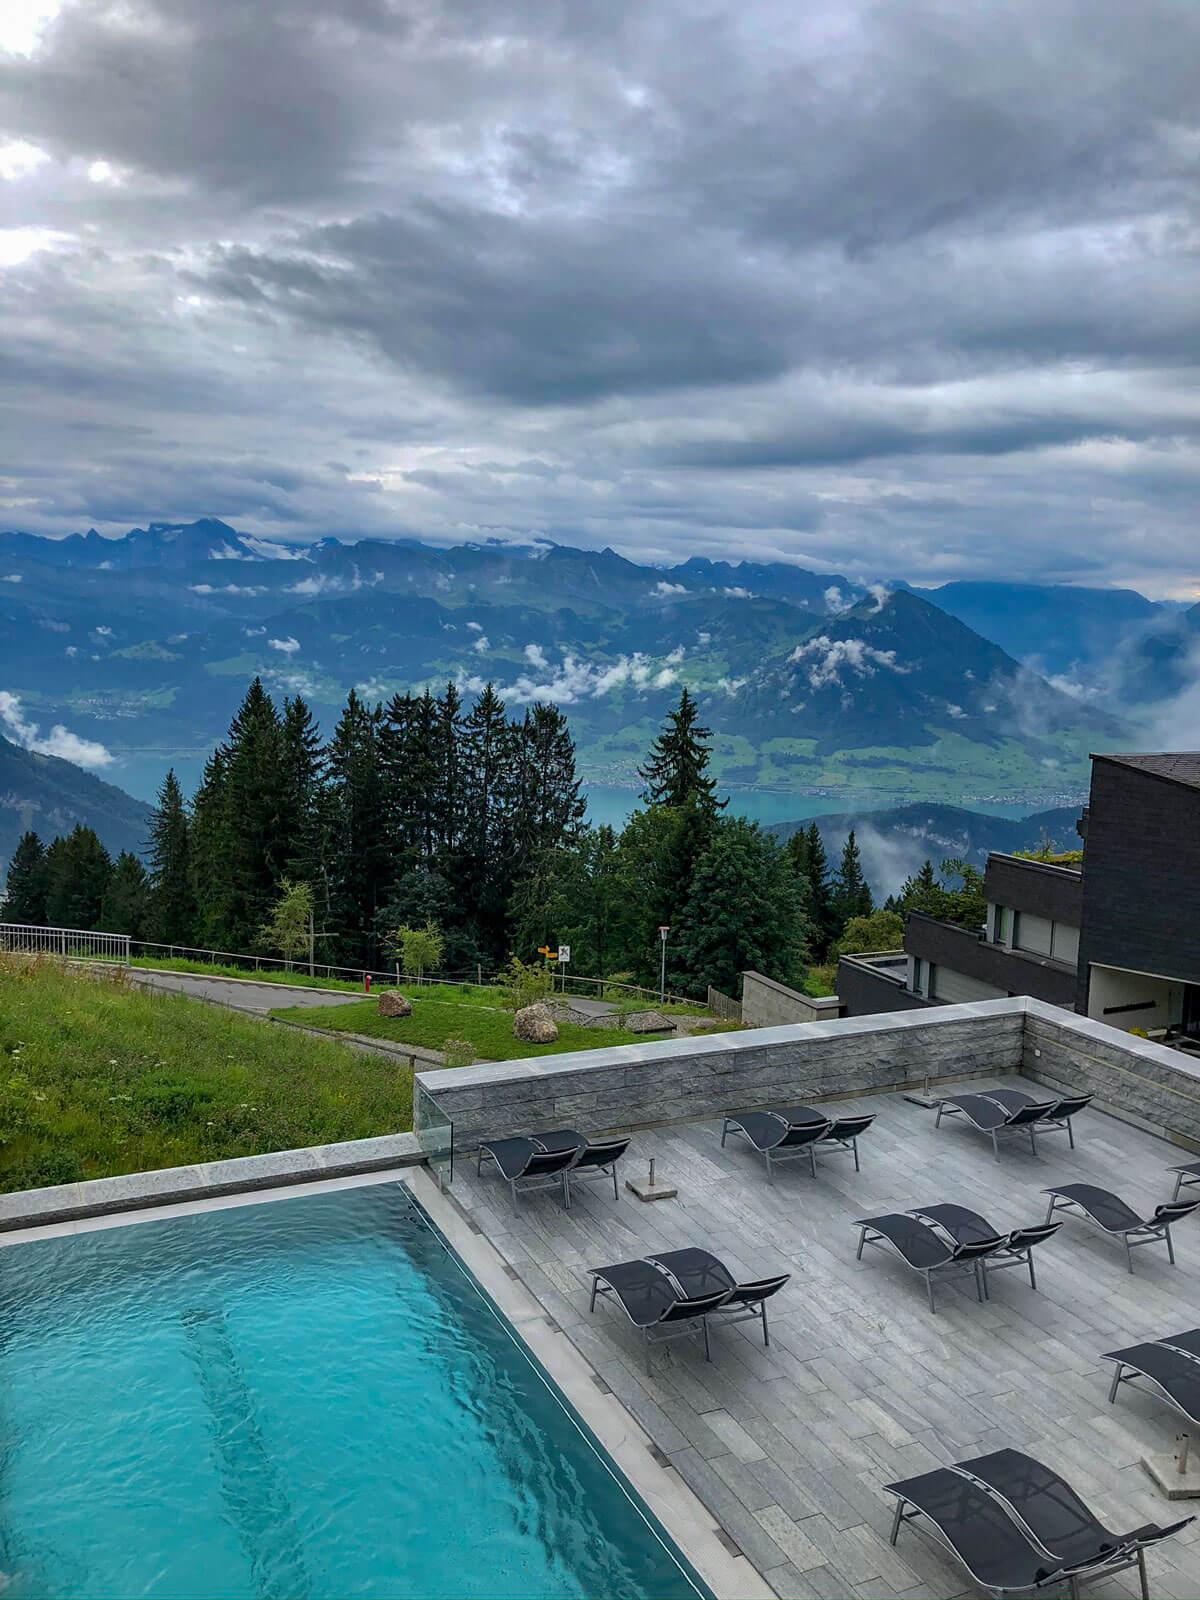 Hotel Rigi Kaltbad Spa und Pool